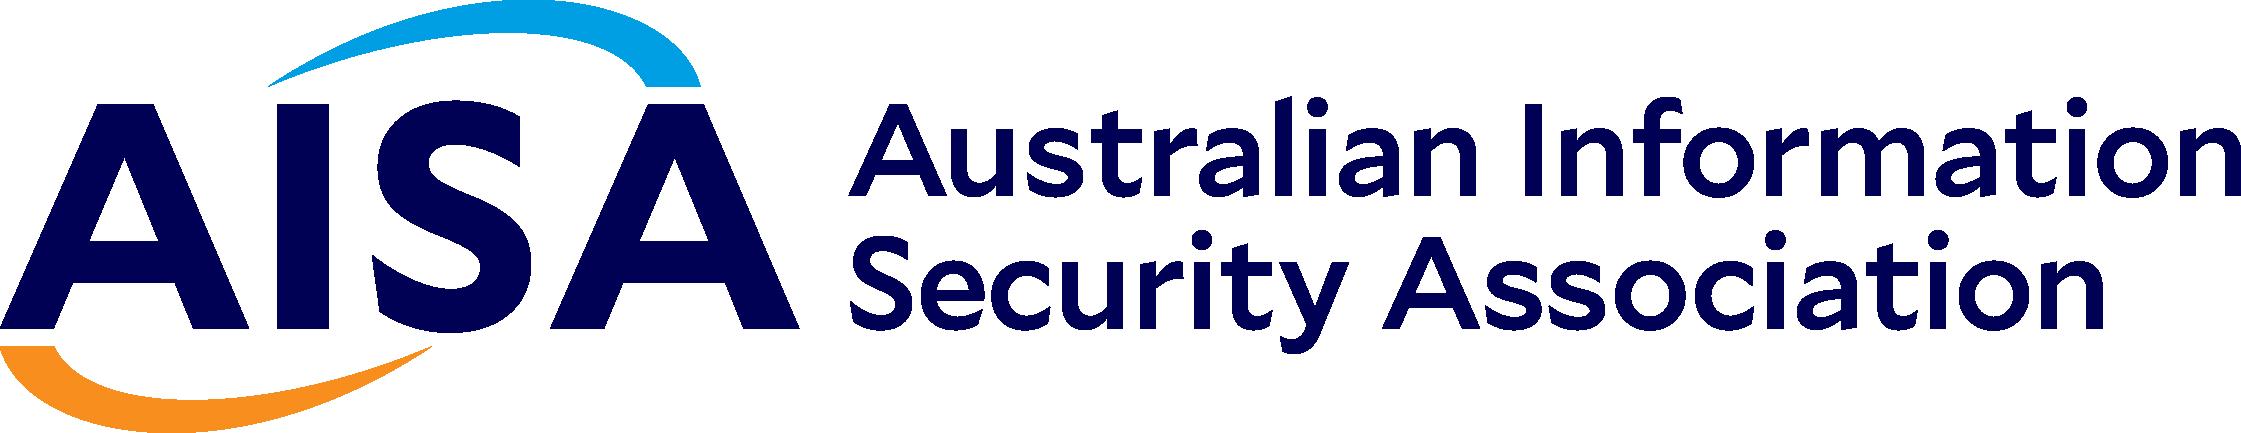 Logo der Australian Information Security Association (AISA)